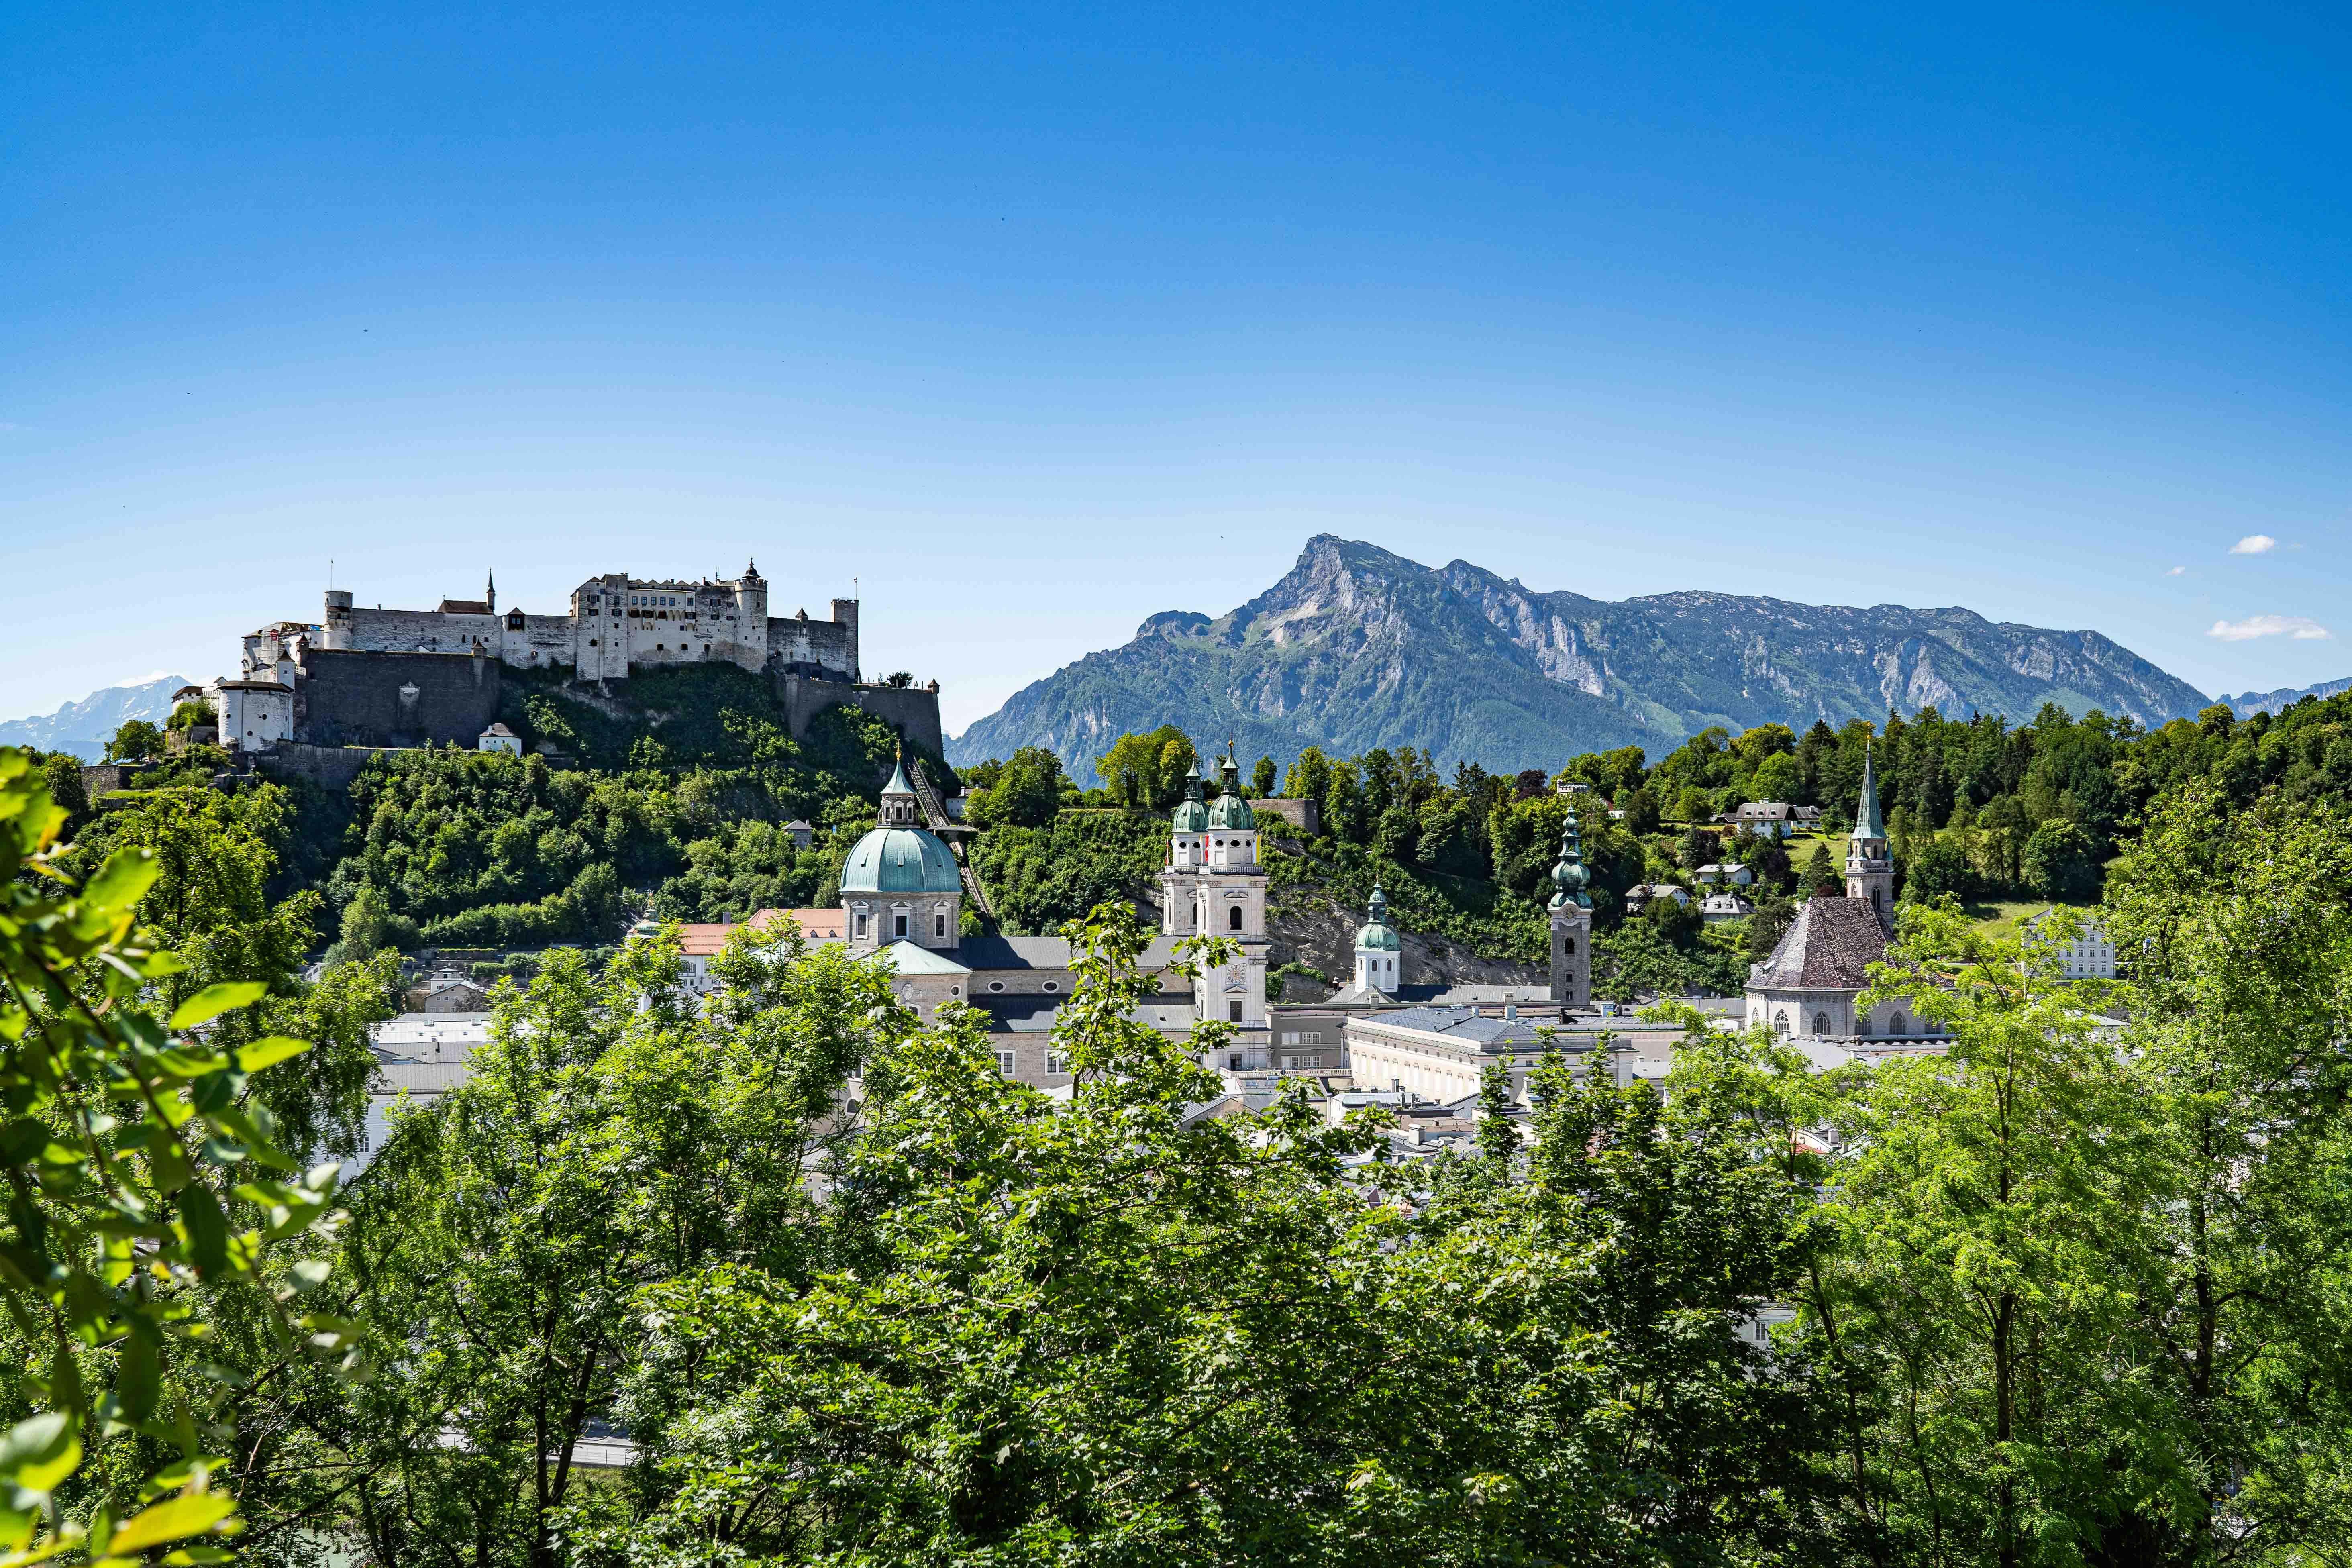 Festung-Untersberg-Dom